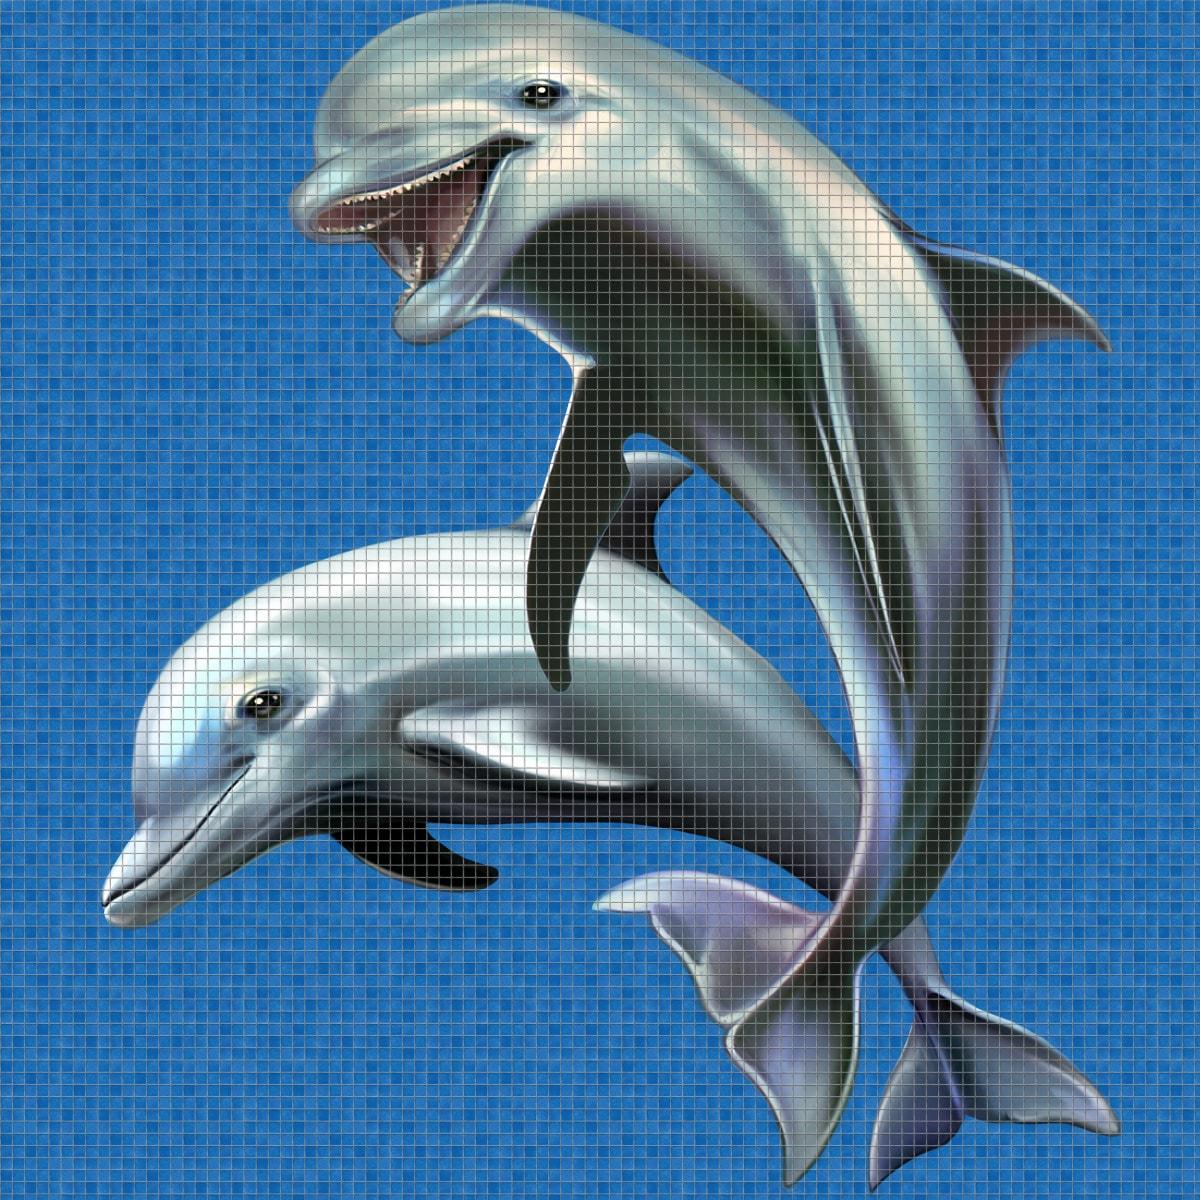 Happy-Dolphins-Digital-Print-Mosaic-Ezarri.jpg